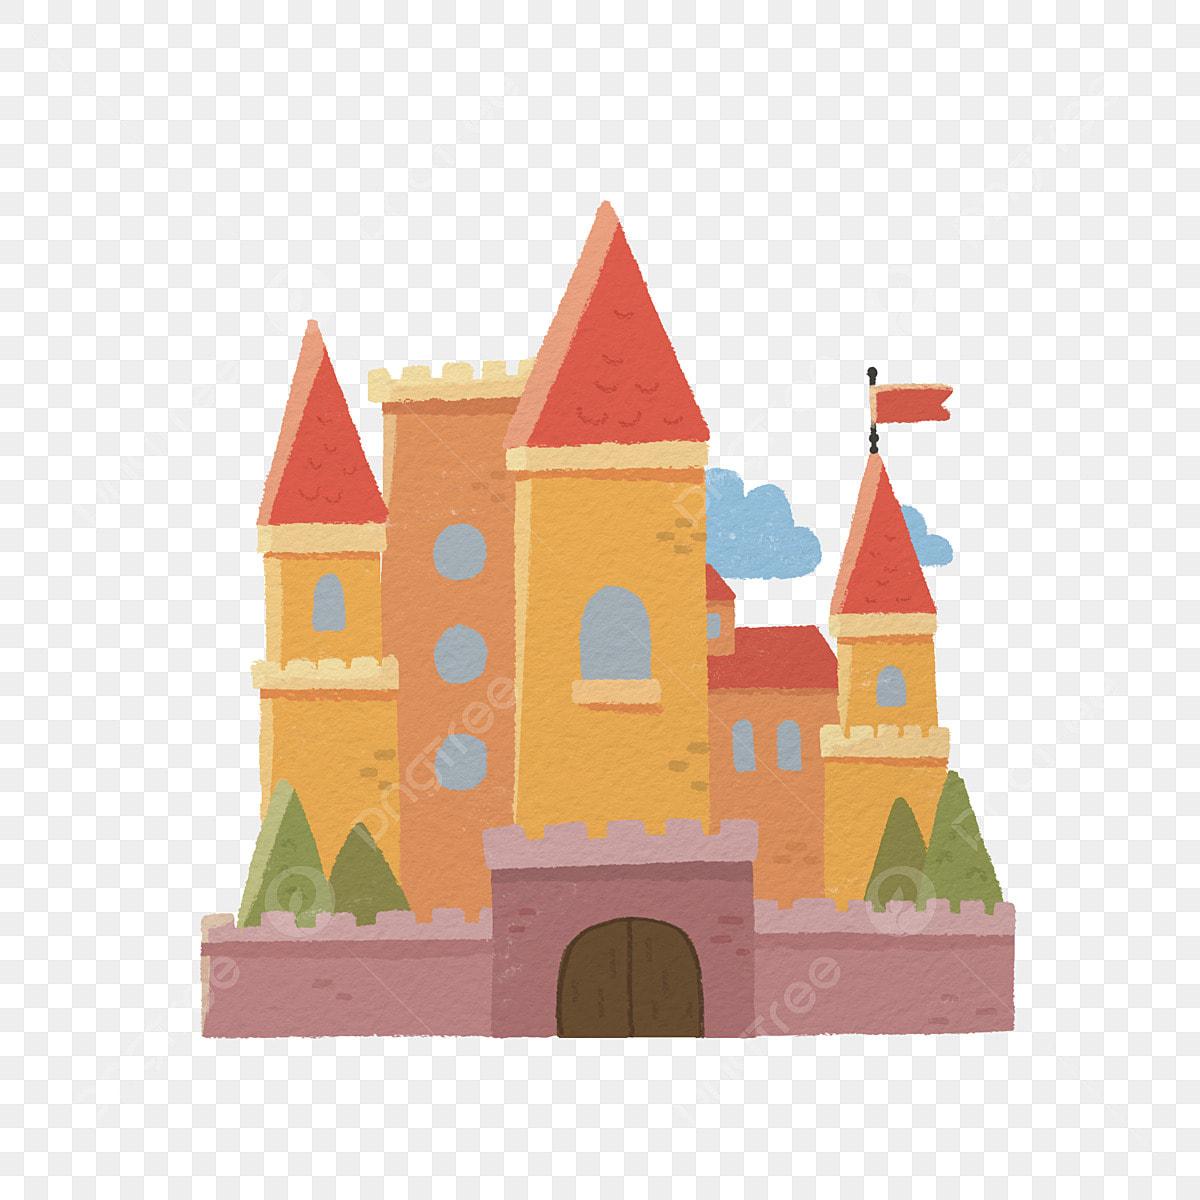 Hand Drawn Crayon Cartoon Castle Medieval Castle European Castle Castle Png Transparent Clipart Image And Psd File For Free Download